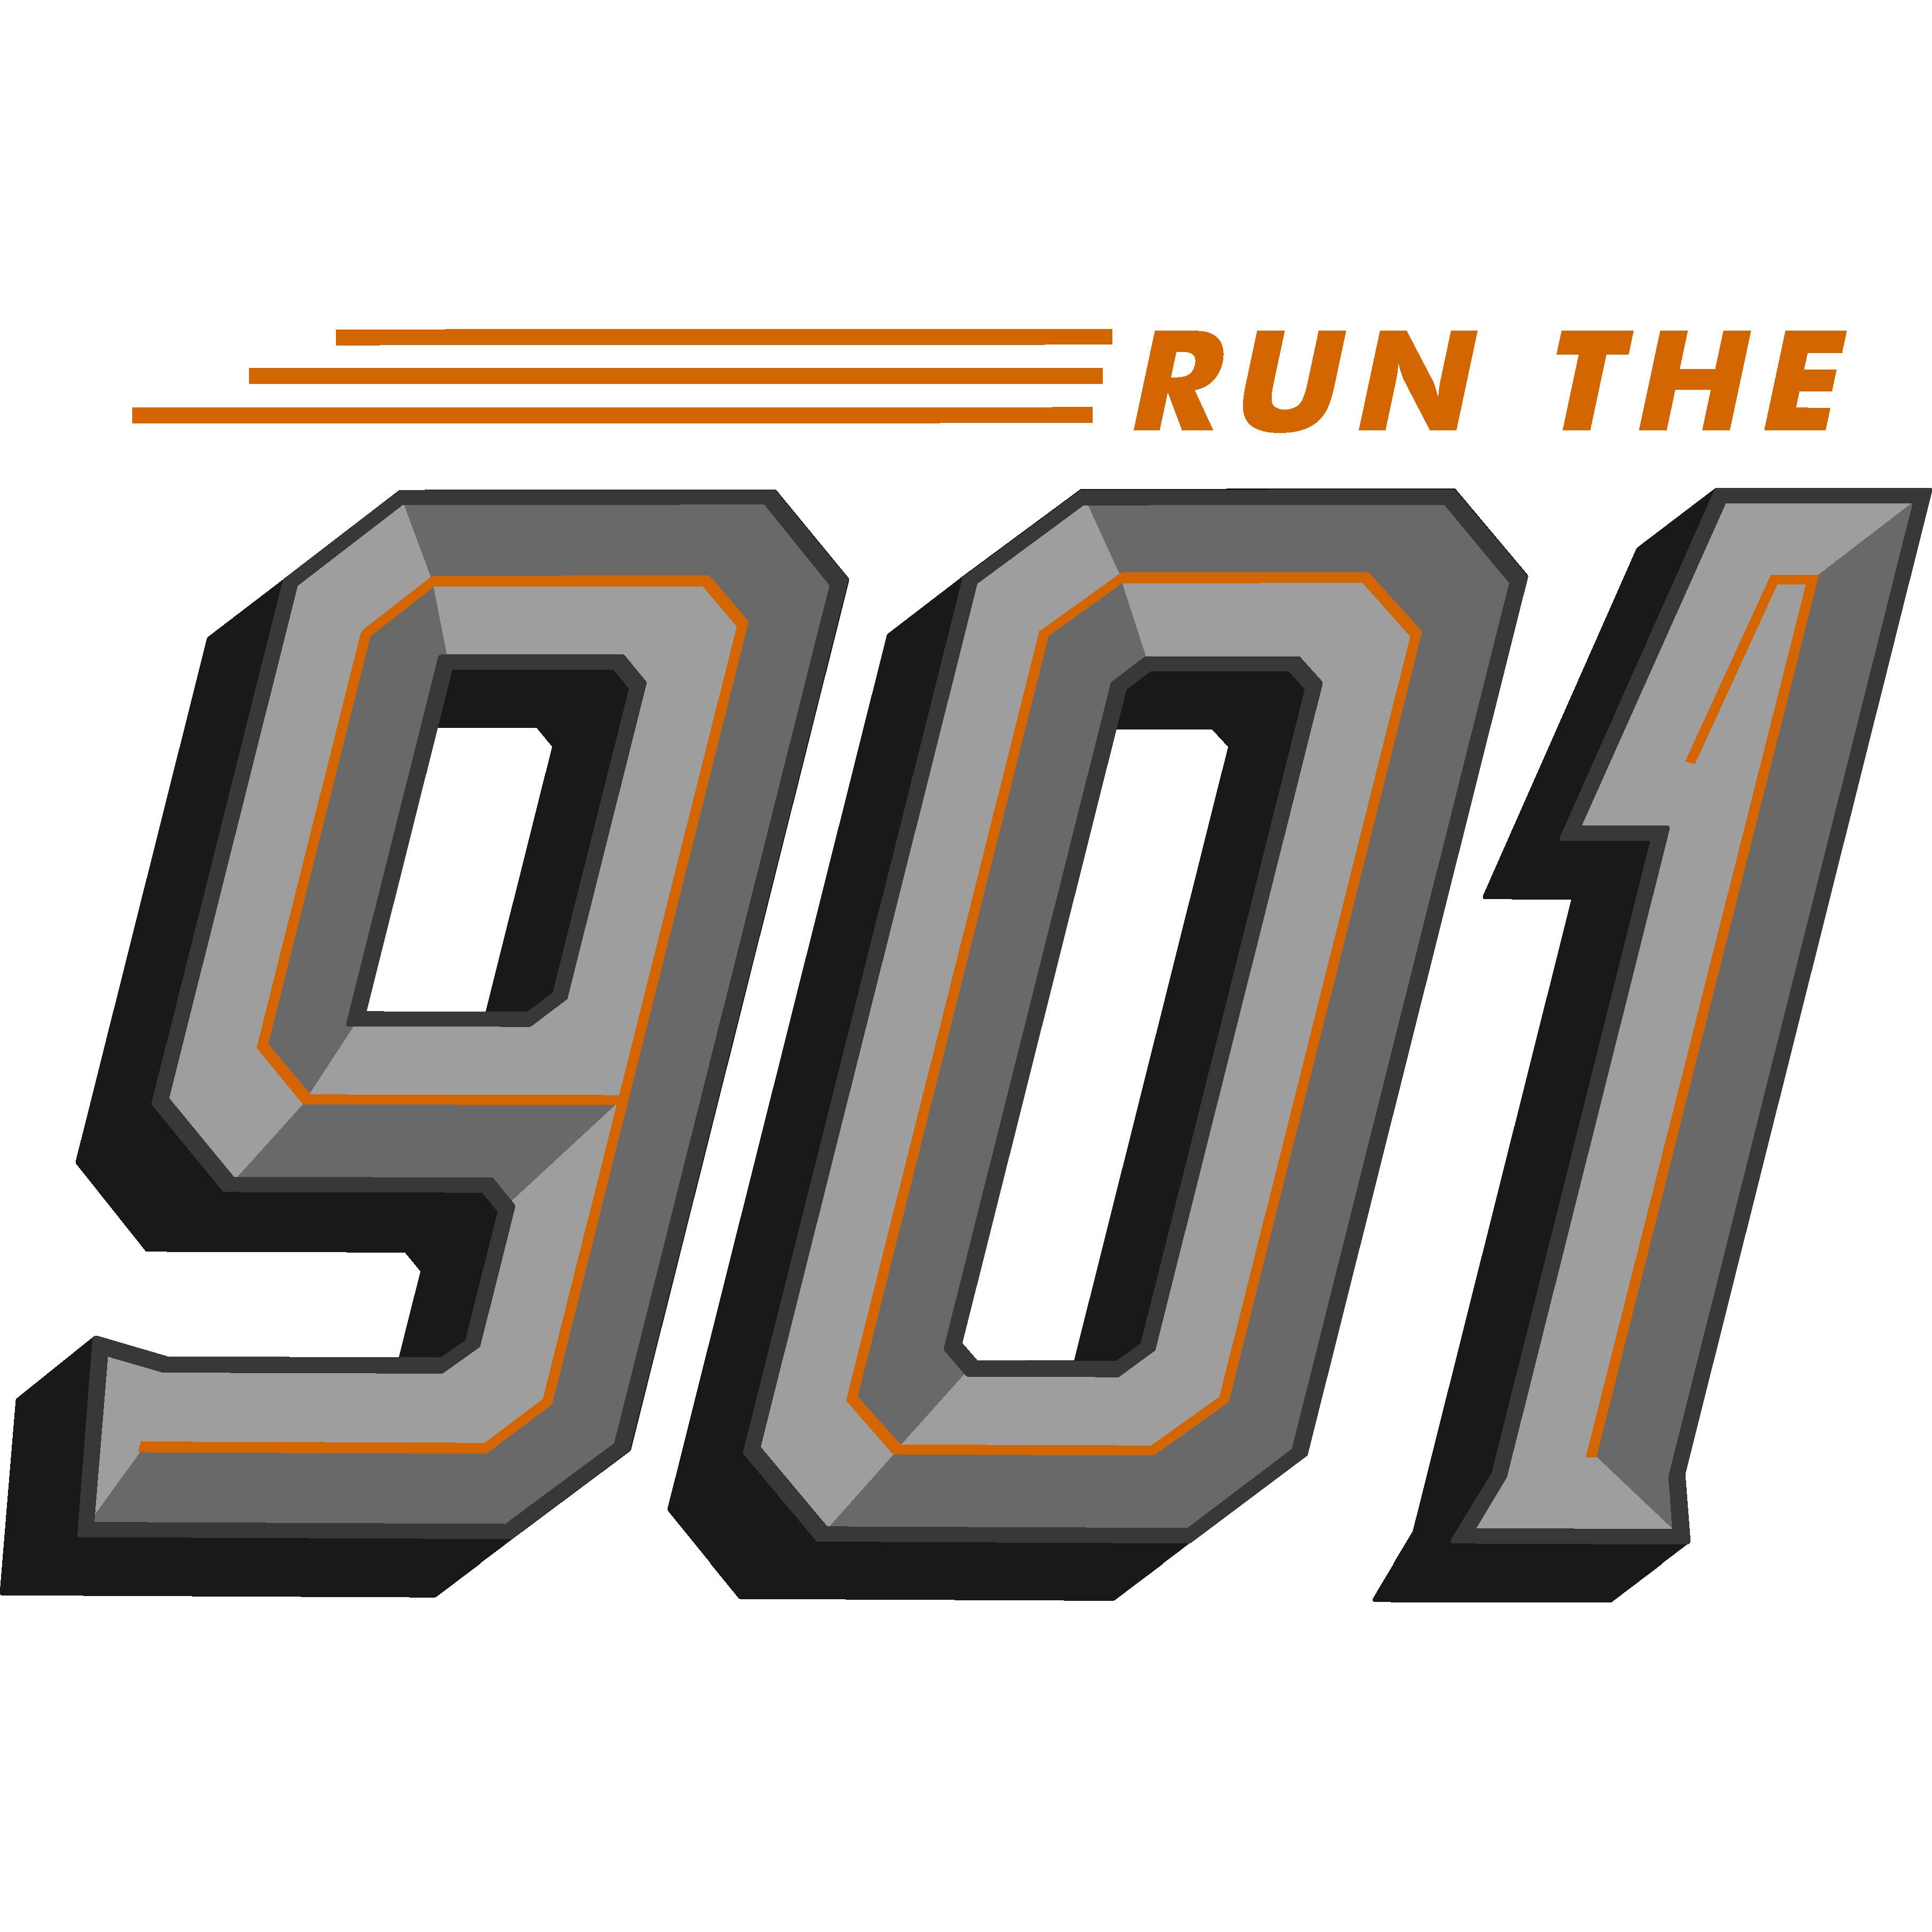 Run the 901